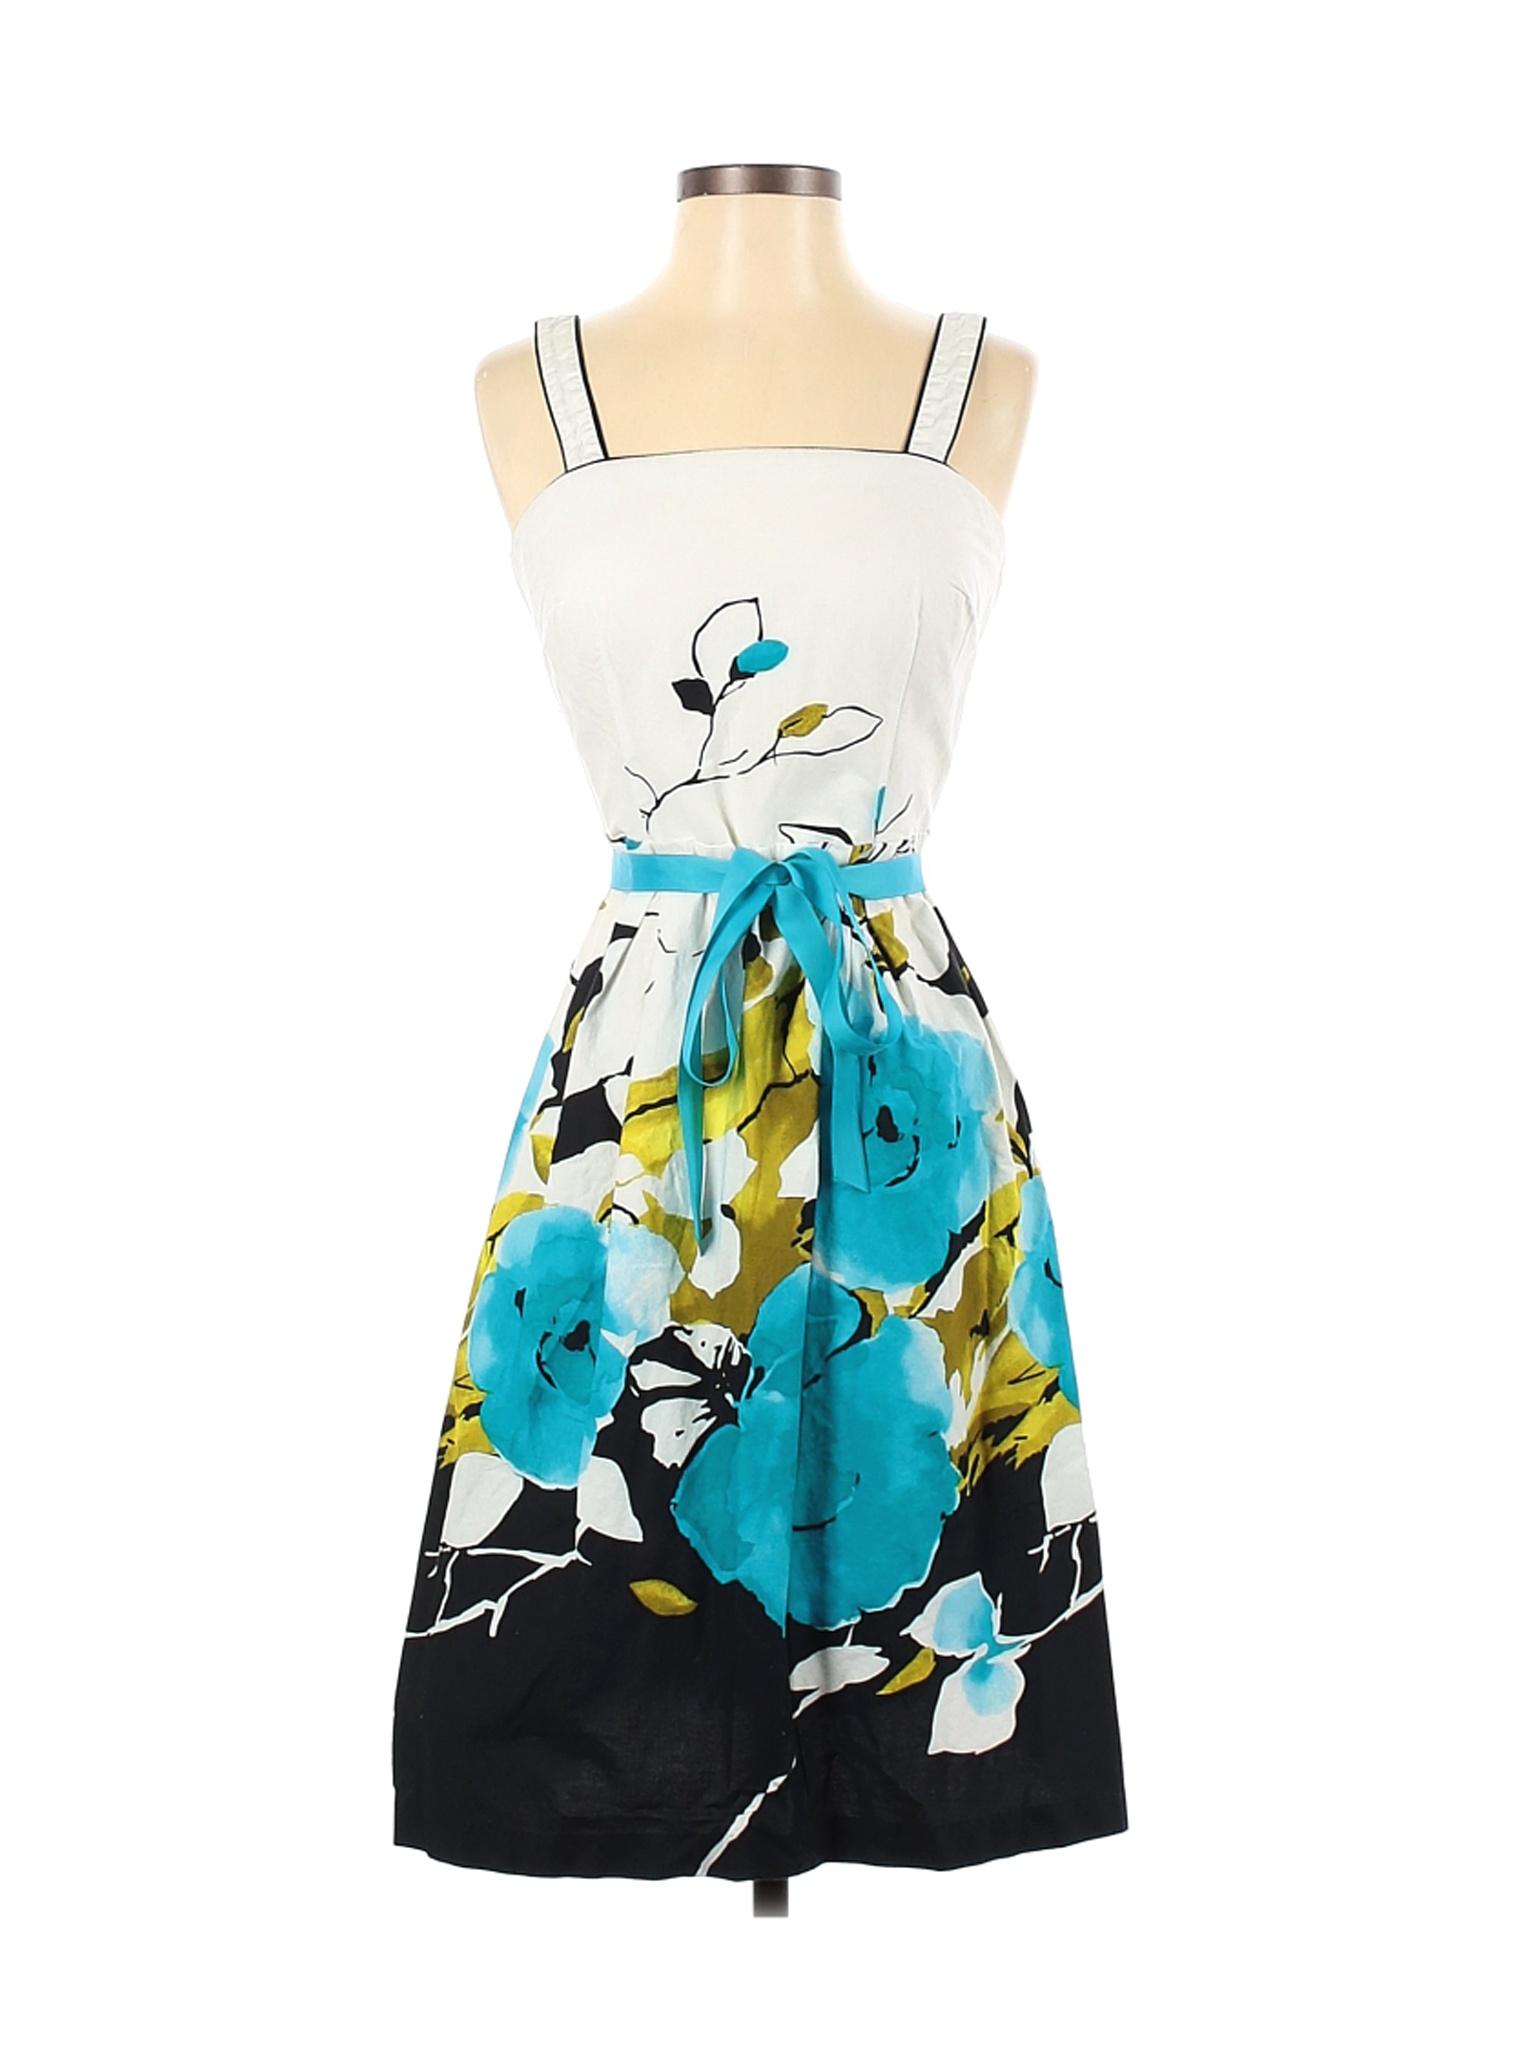 Dressbarn Women S Clothing On Sale Up To 90 Off Retail Thredup